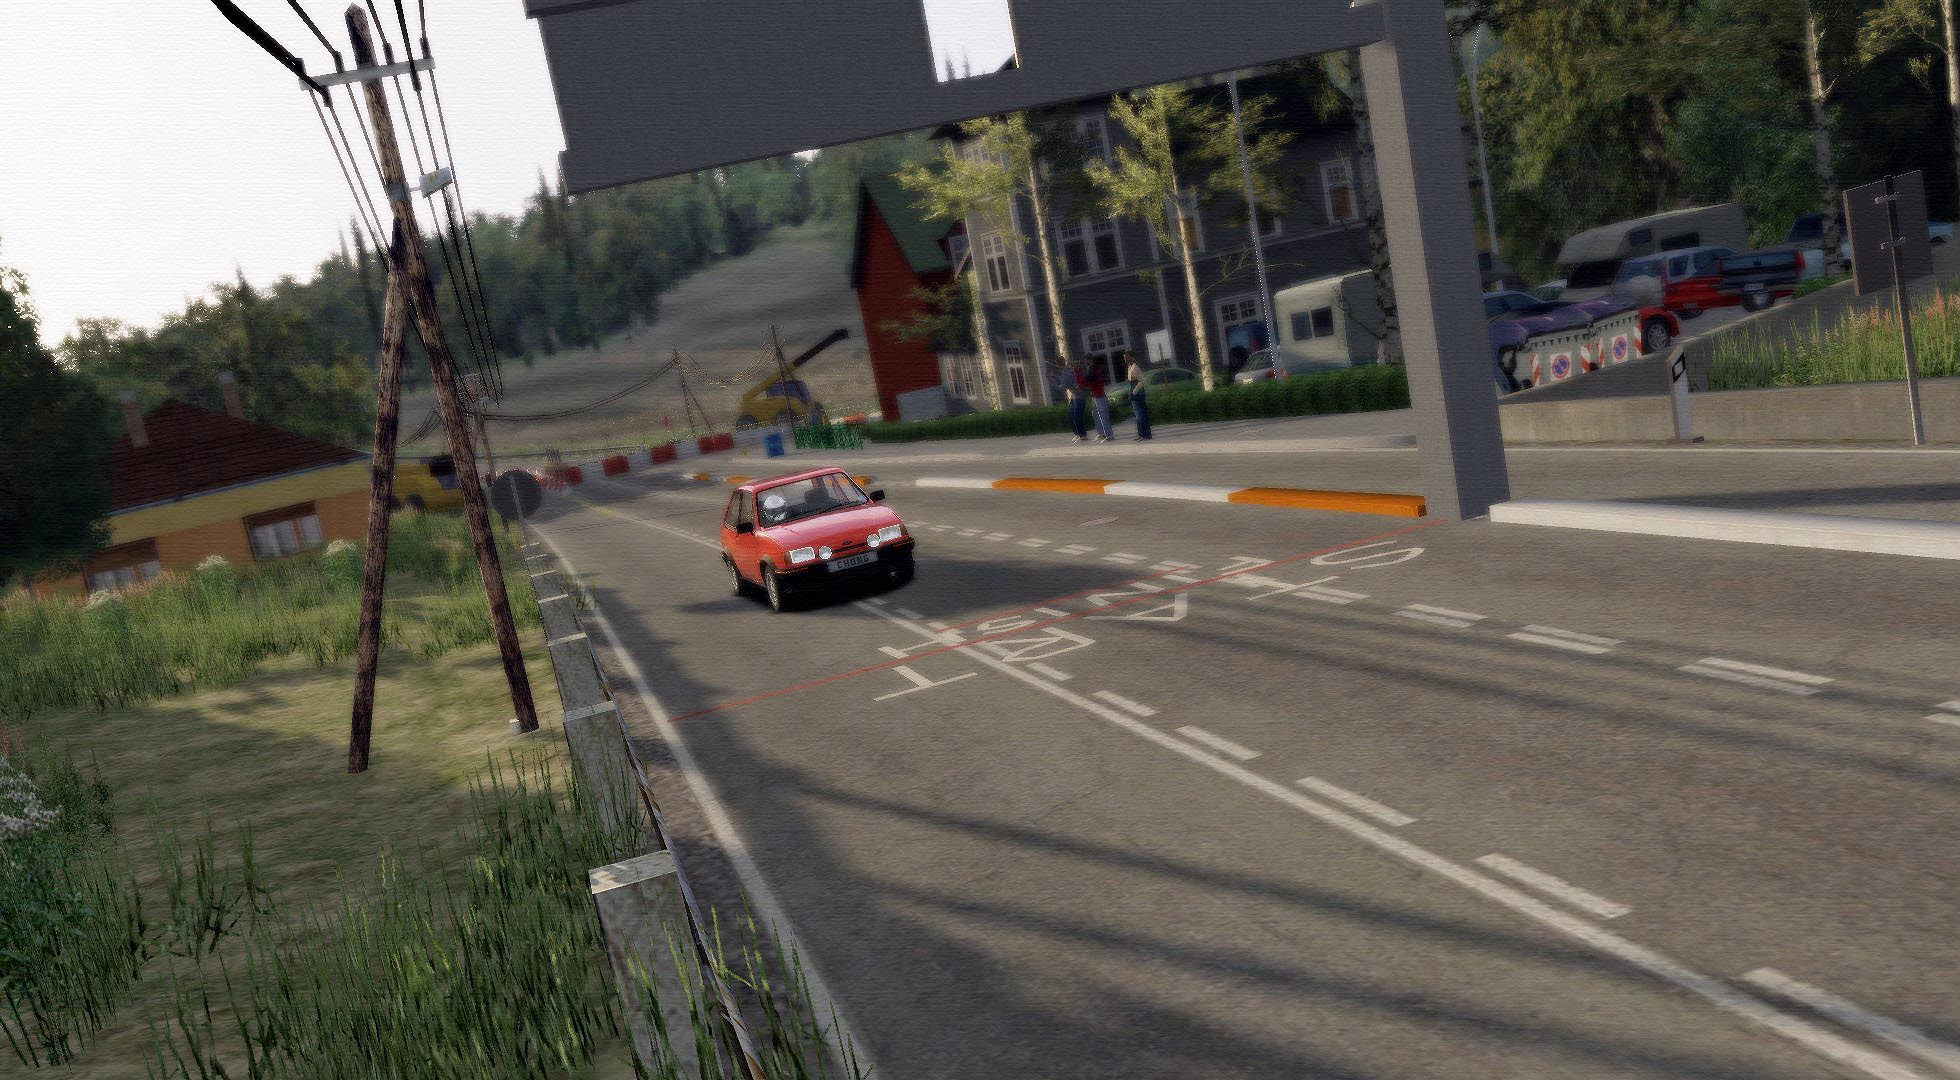 Screenshot_ford_fiesta_xr2_Matsugadake_17-7-117-18-31-33.jpg